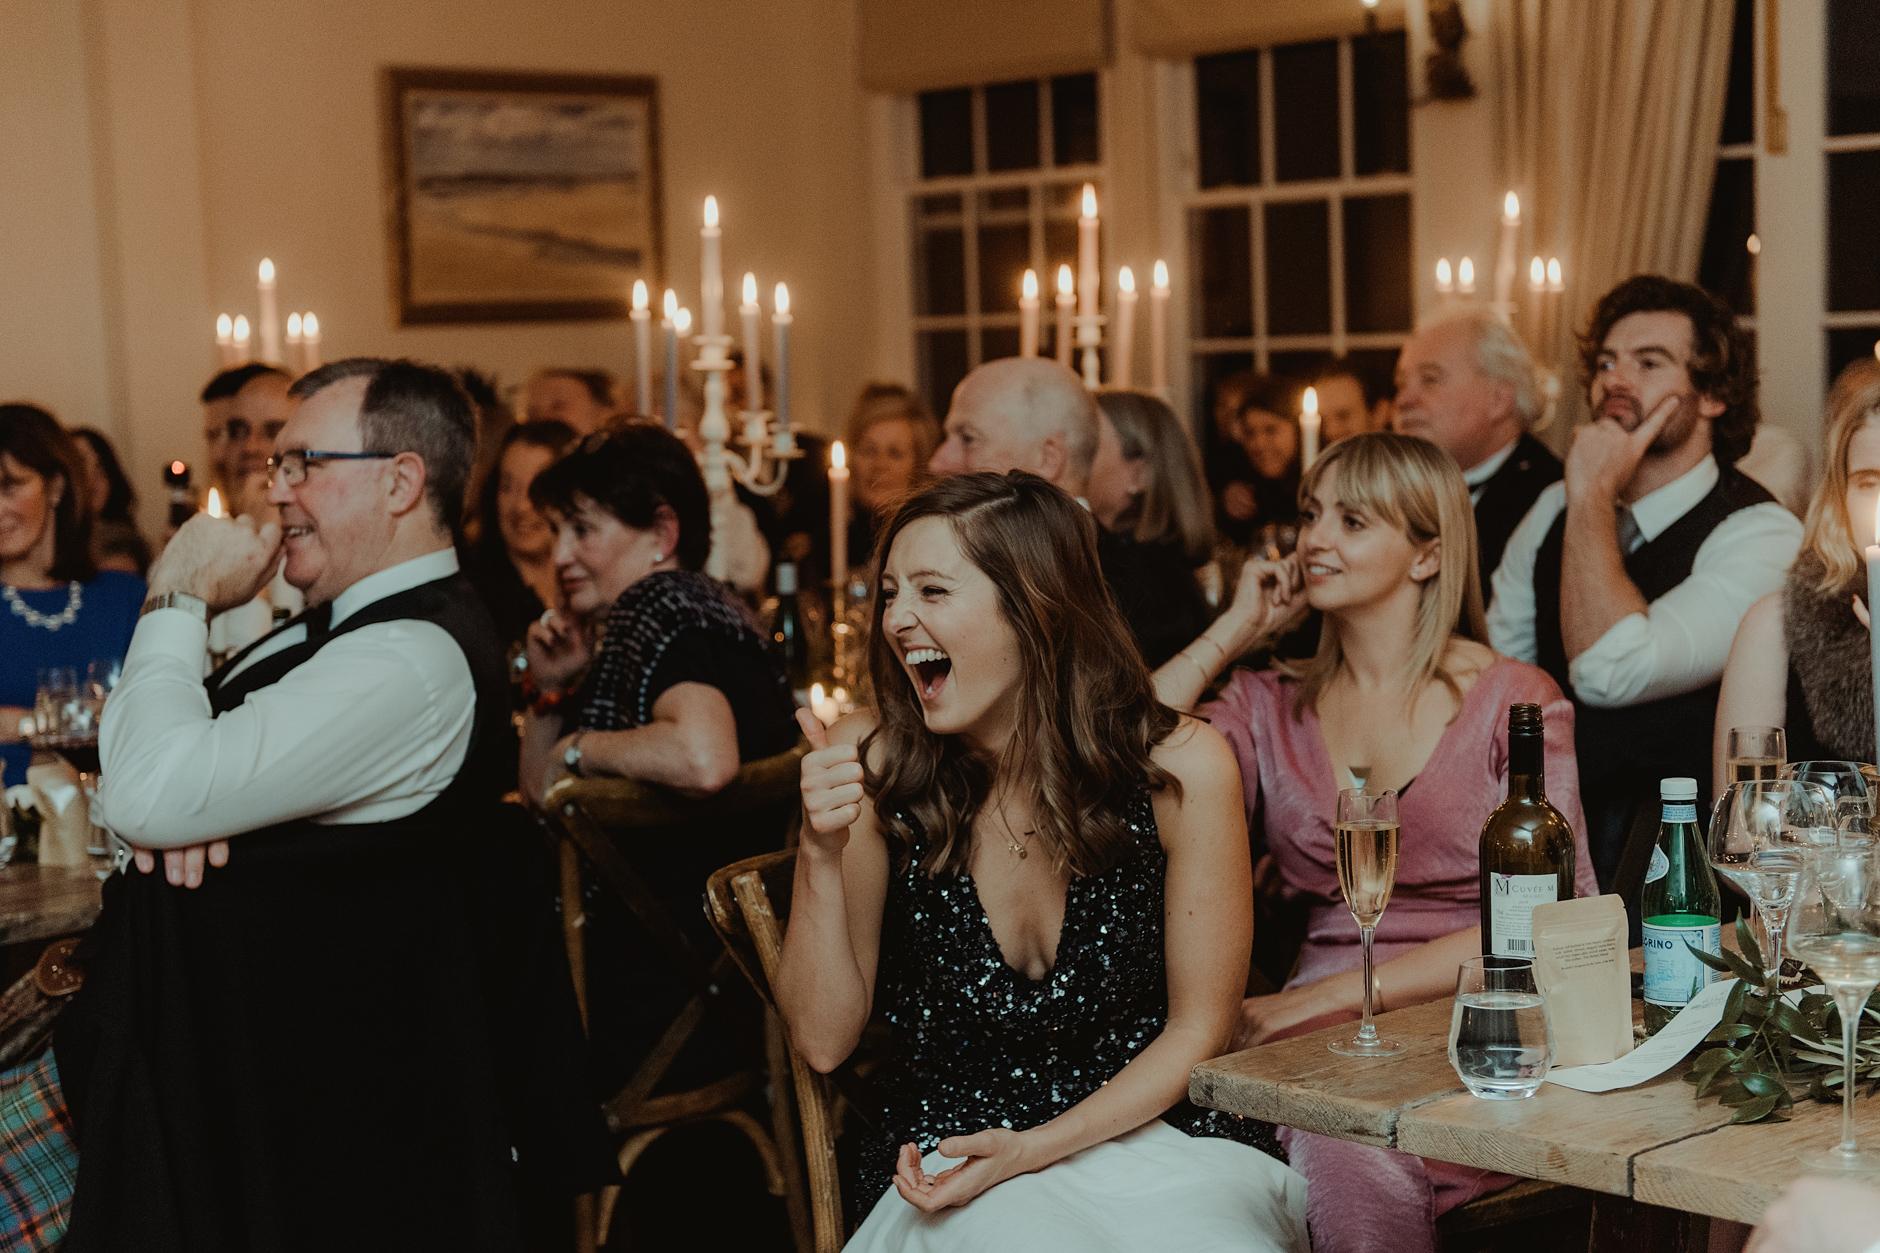 Glentruim-Wedding-Nikki-Leadbetter-Photography-269.jpg